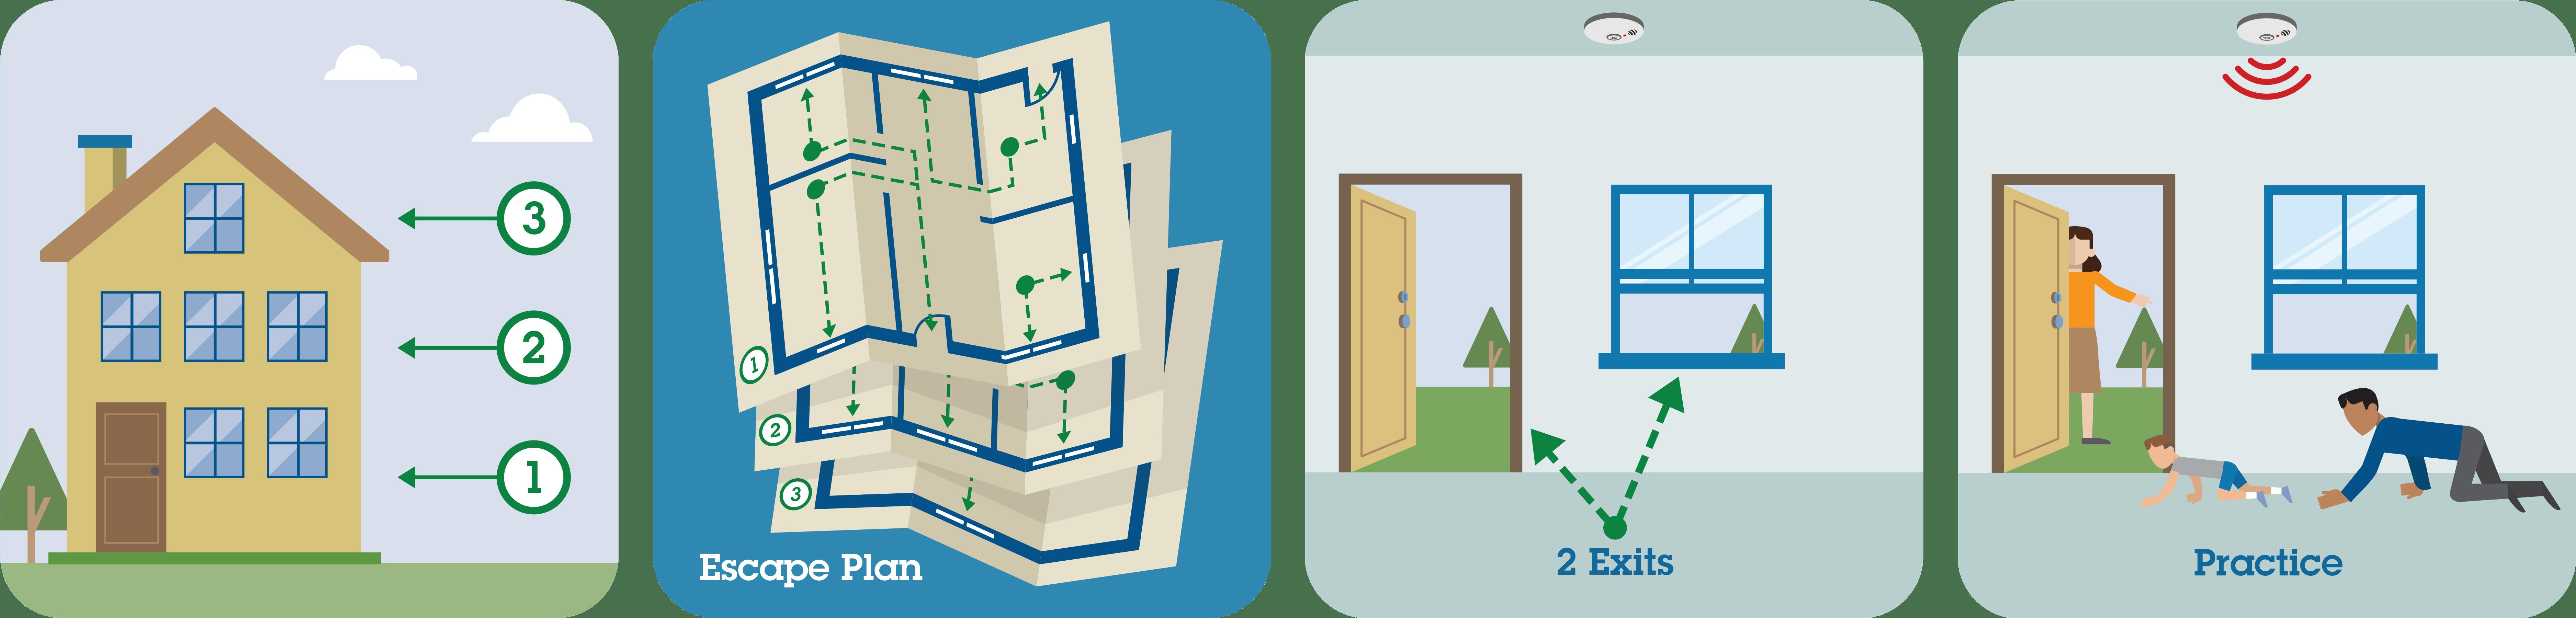 Home escape plan infographic